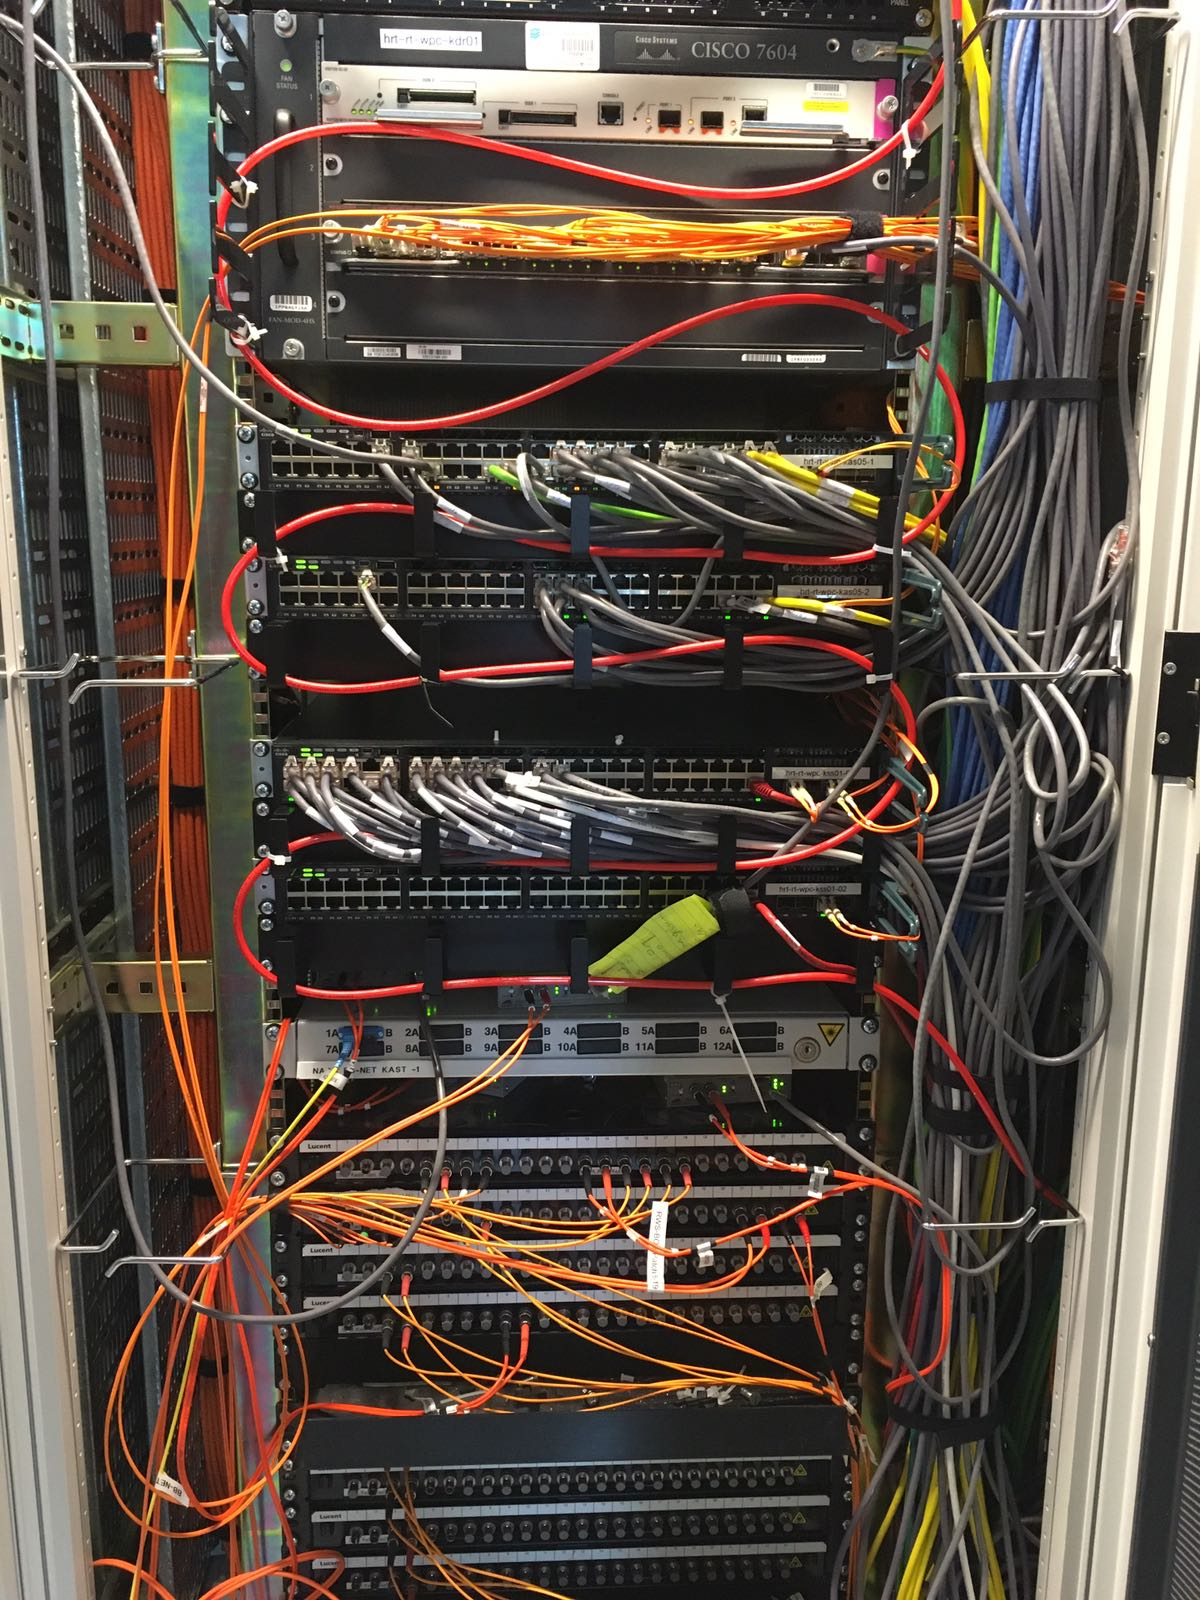 quadro server.JPG